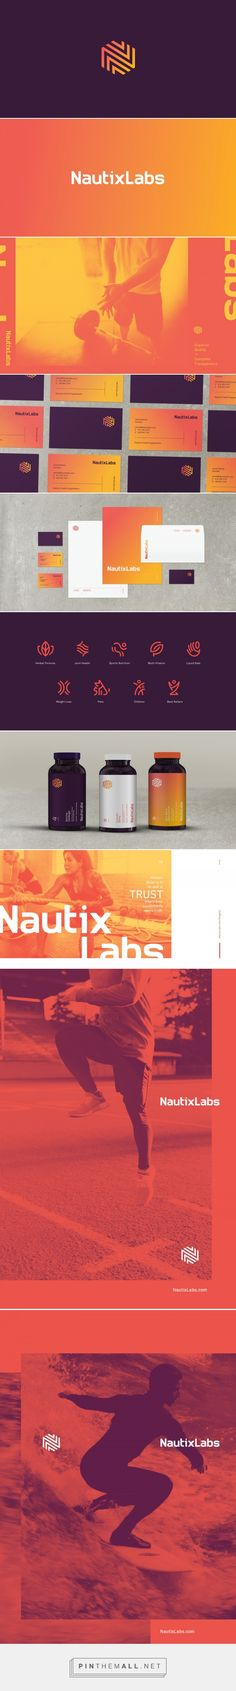 NautixLabs | Mast | Fivestar Branding – Design and Branding Agency & Inspiration Gallery